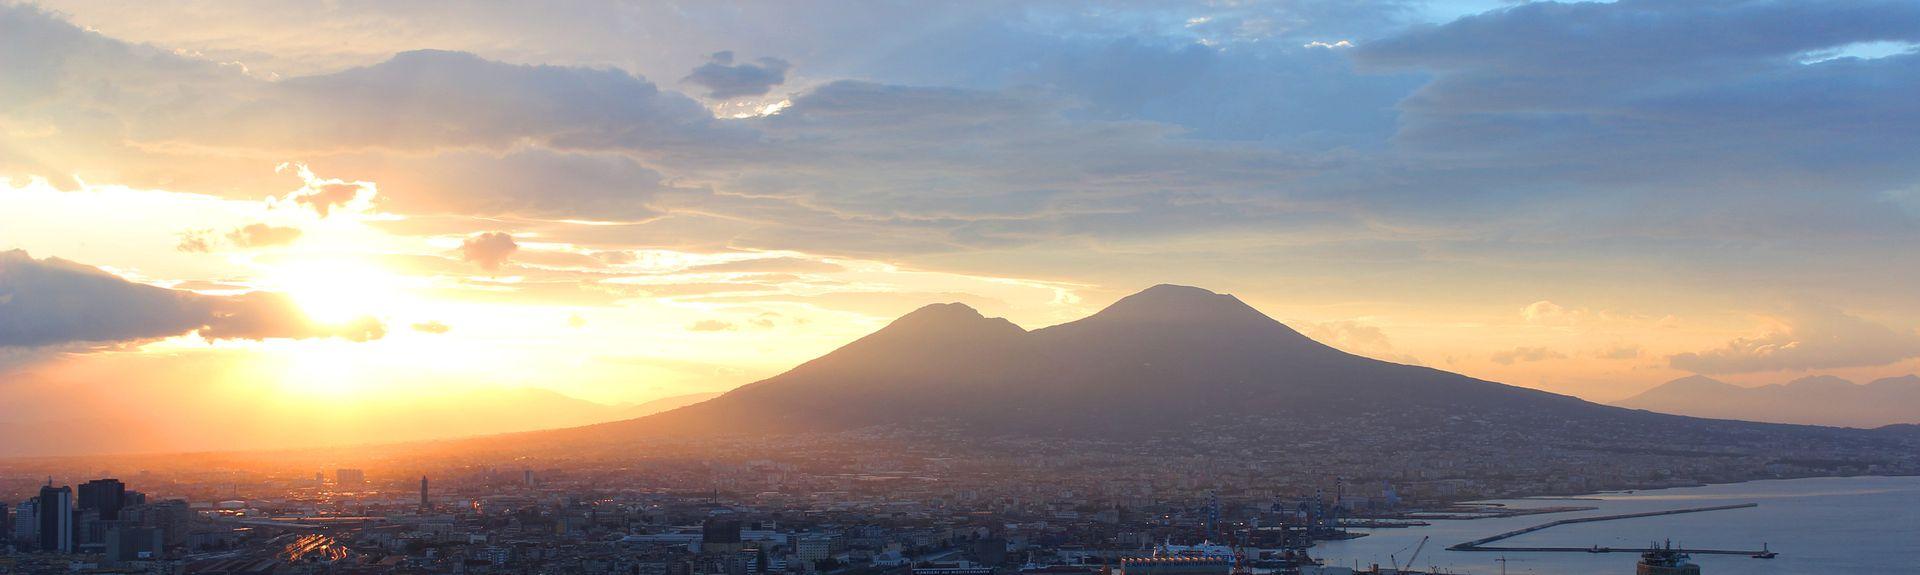 Chiaia, Naples, Campânia, Itália